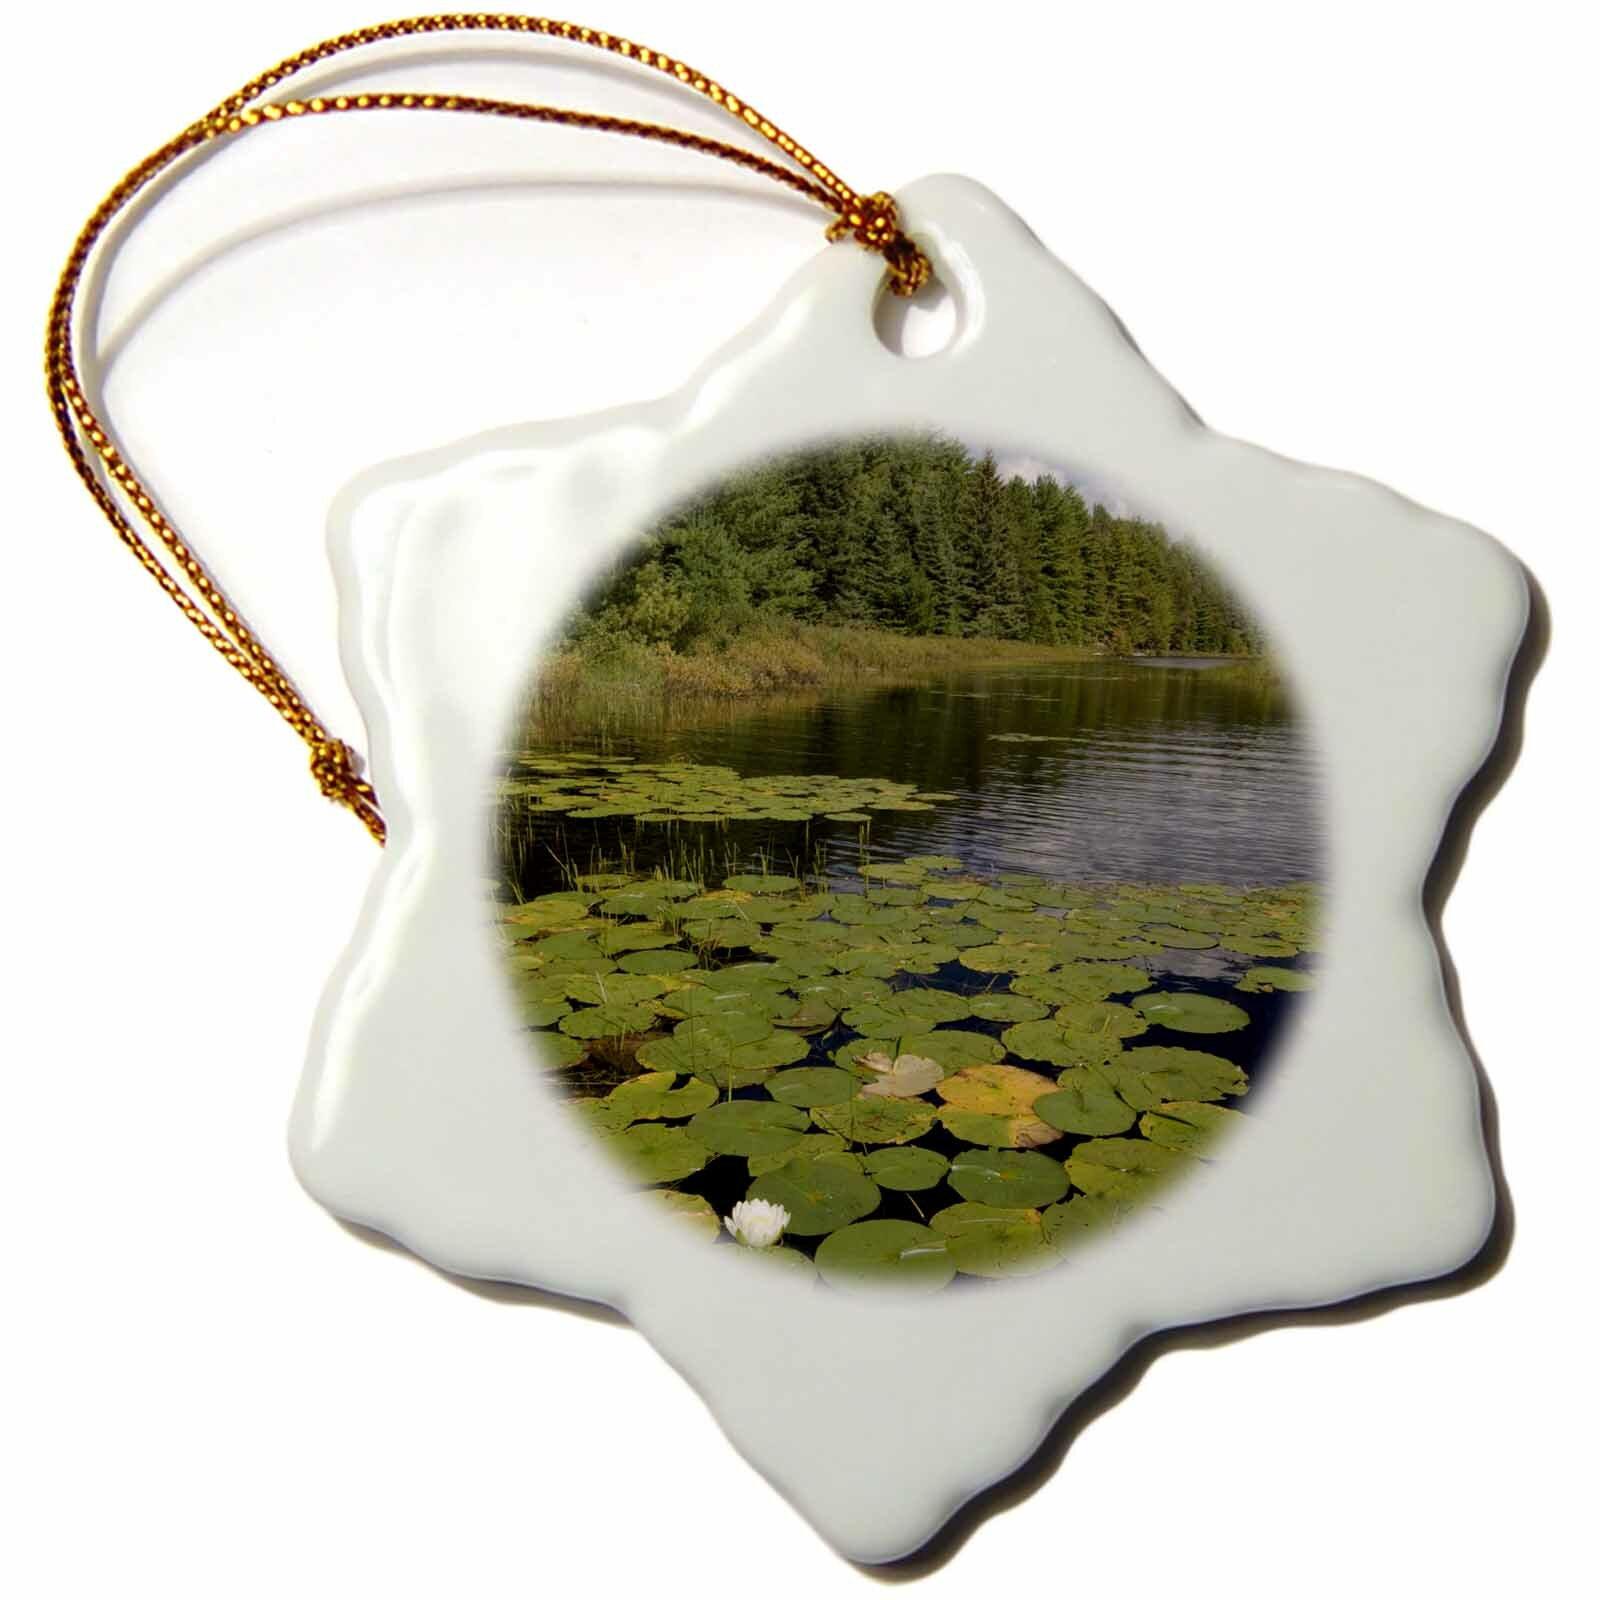 The Holiday Aisle War Club Lake Voyageurs National Park Minnesota Snowflake Holiday Shaped Ornament Wayfair